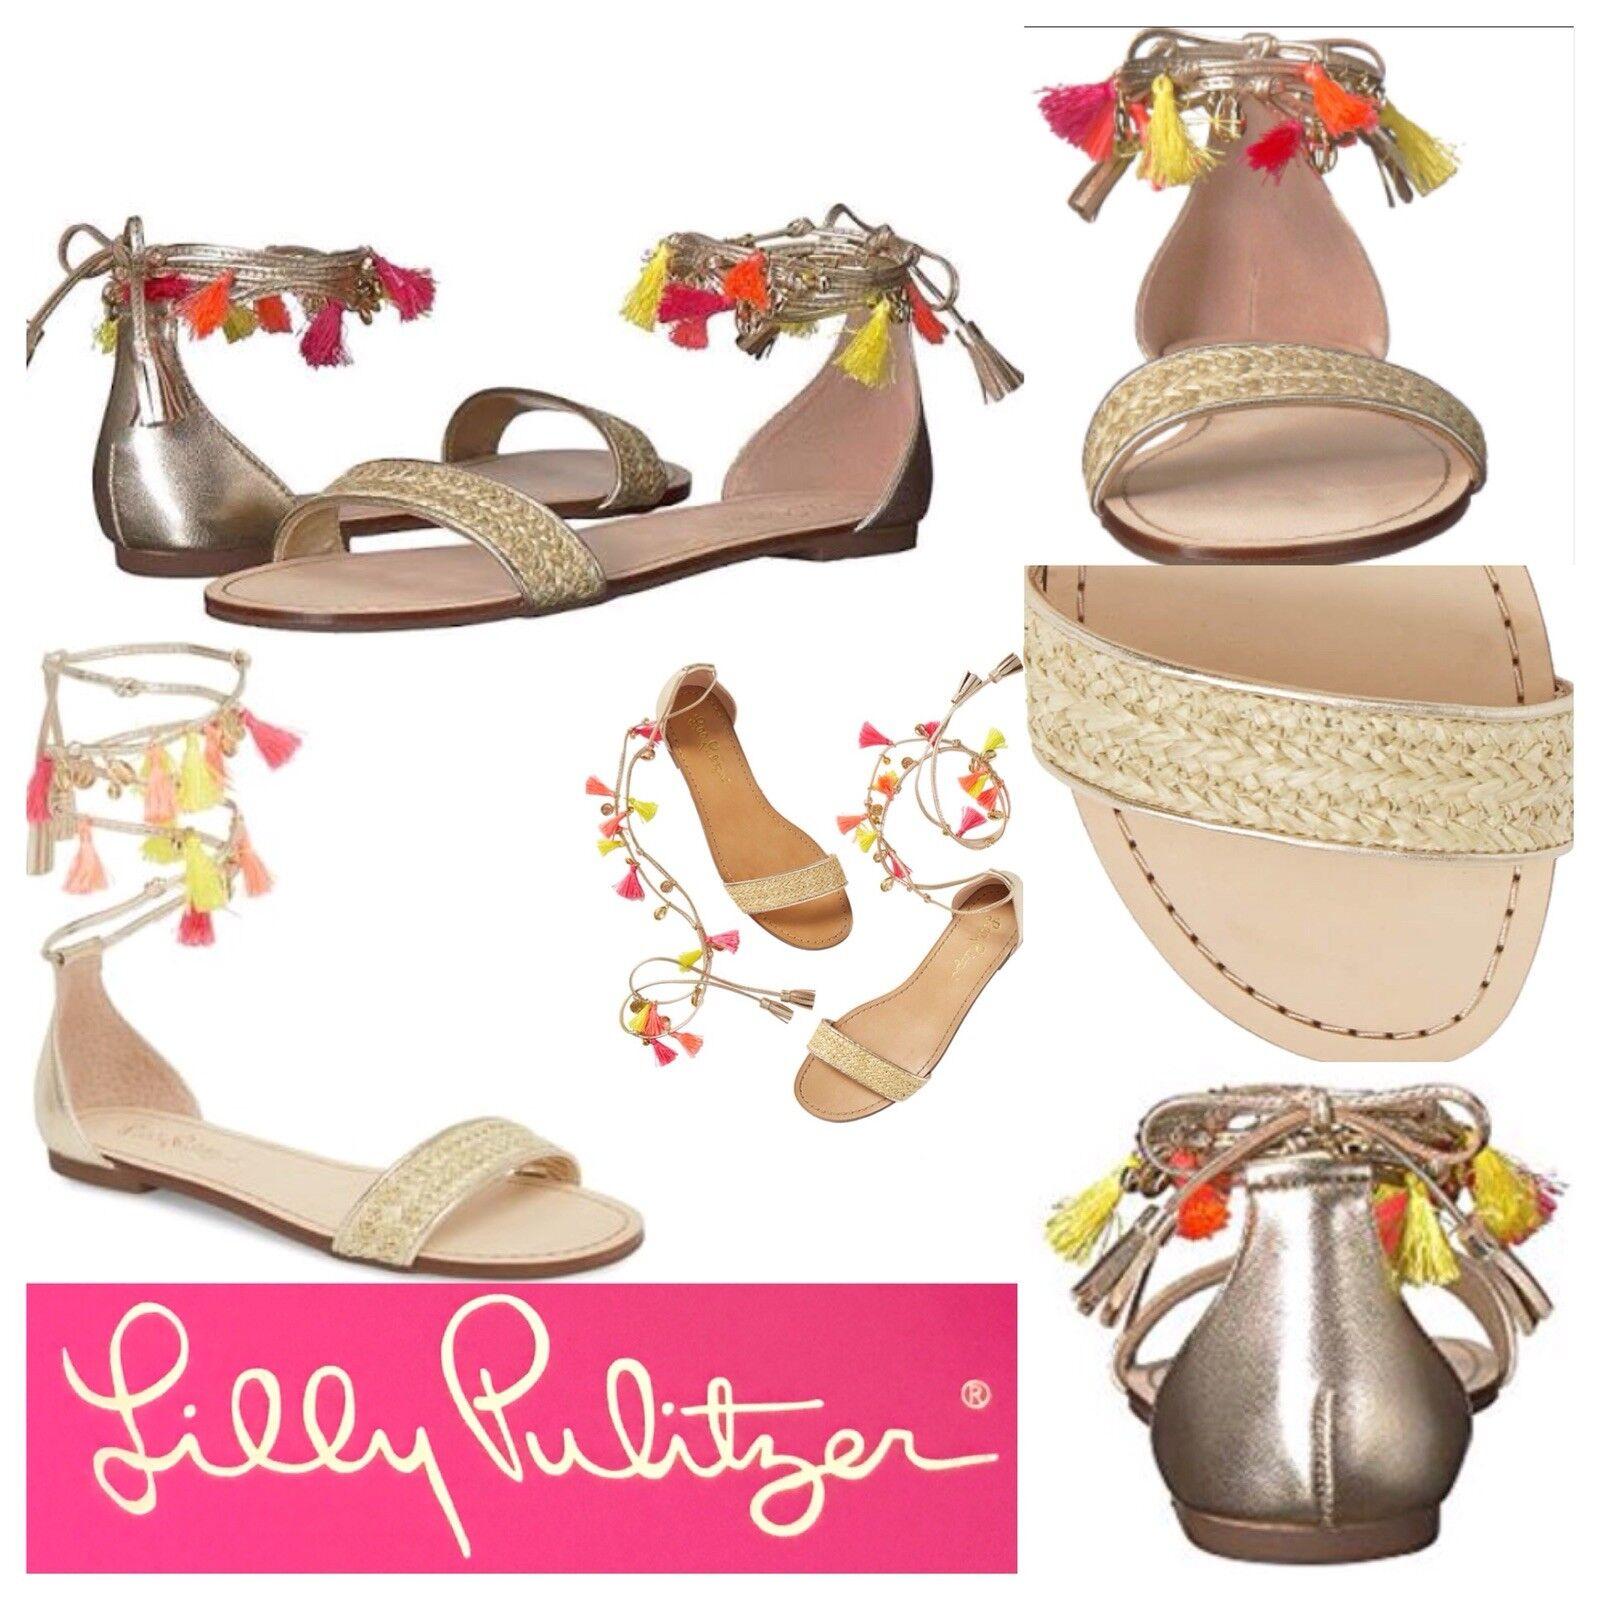 NIB  168 Lilly Pulitzer Willa Sandal oro Metallic Tassel Trim Ankle Wrap 8.5M